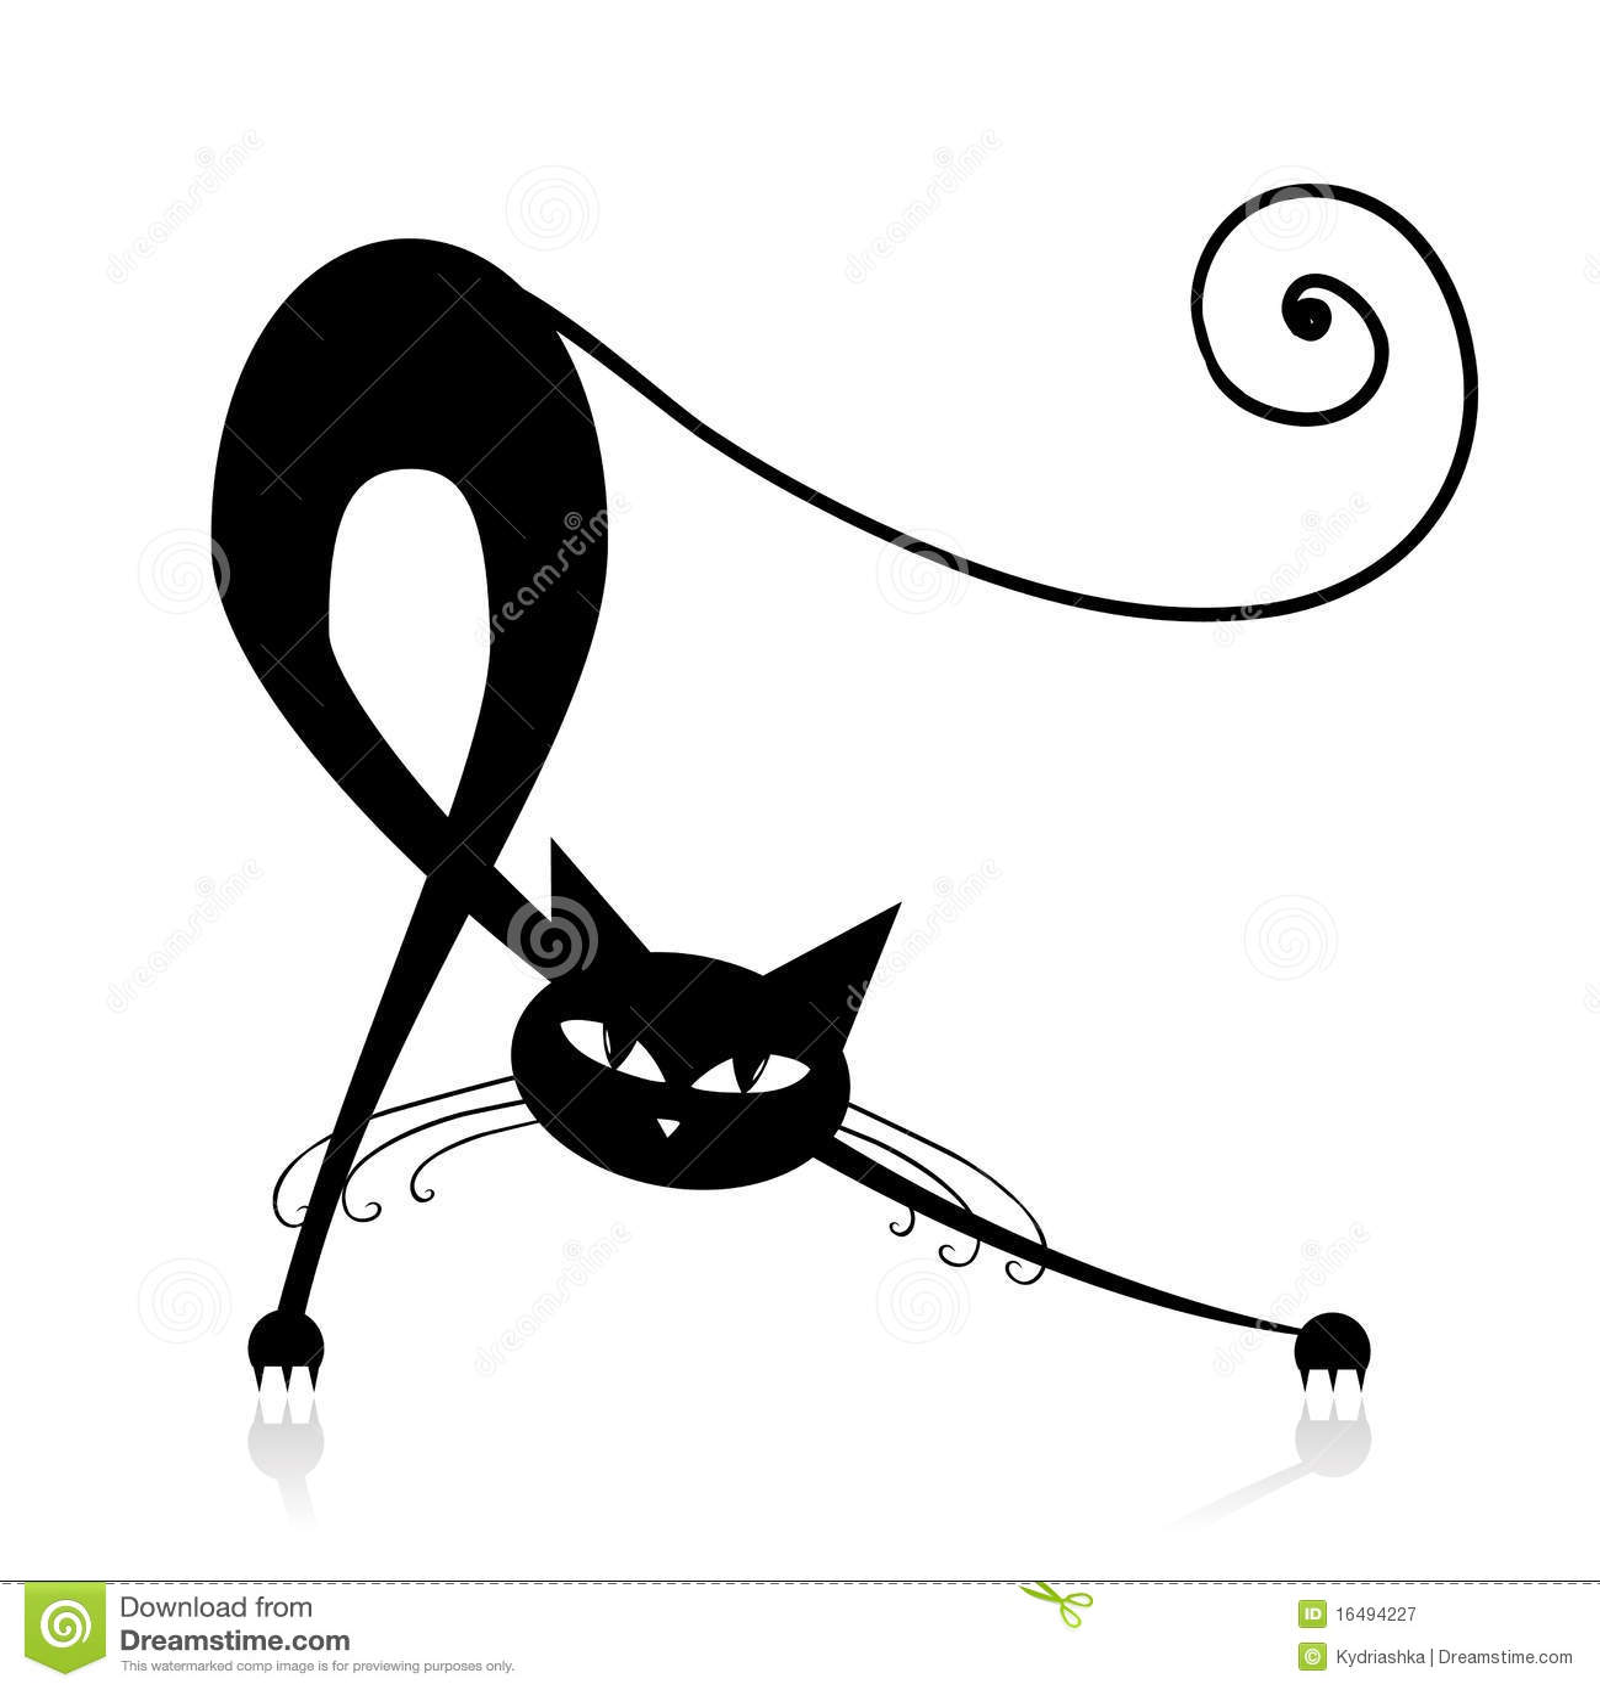 silueta de gato negro - photo #37